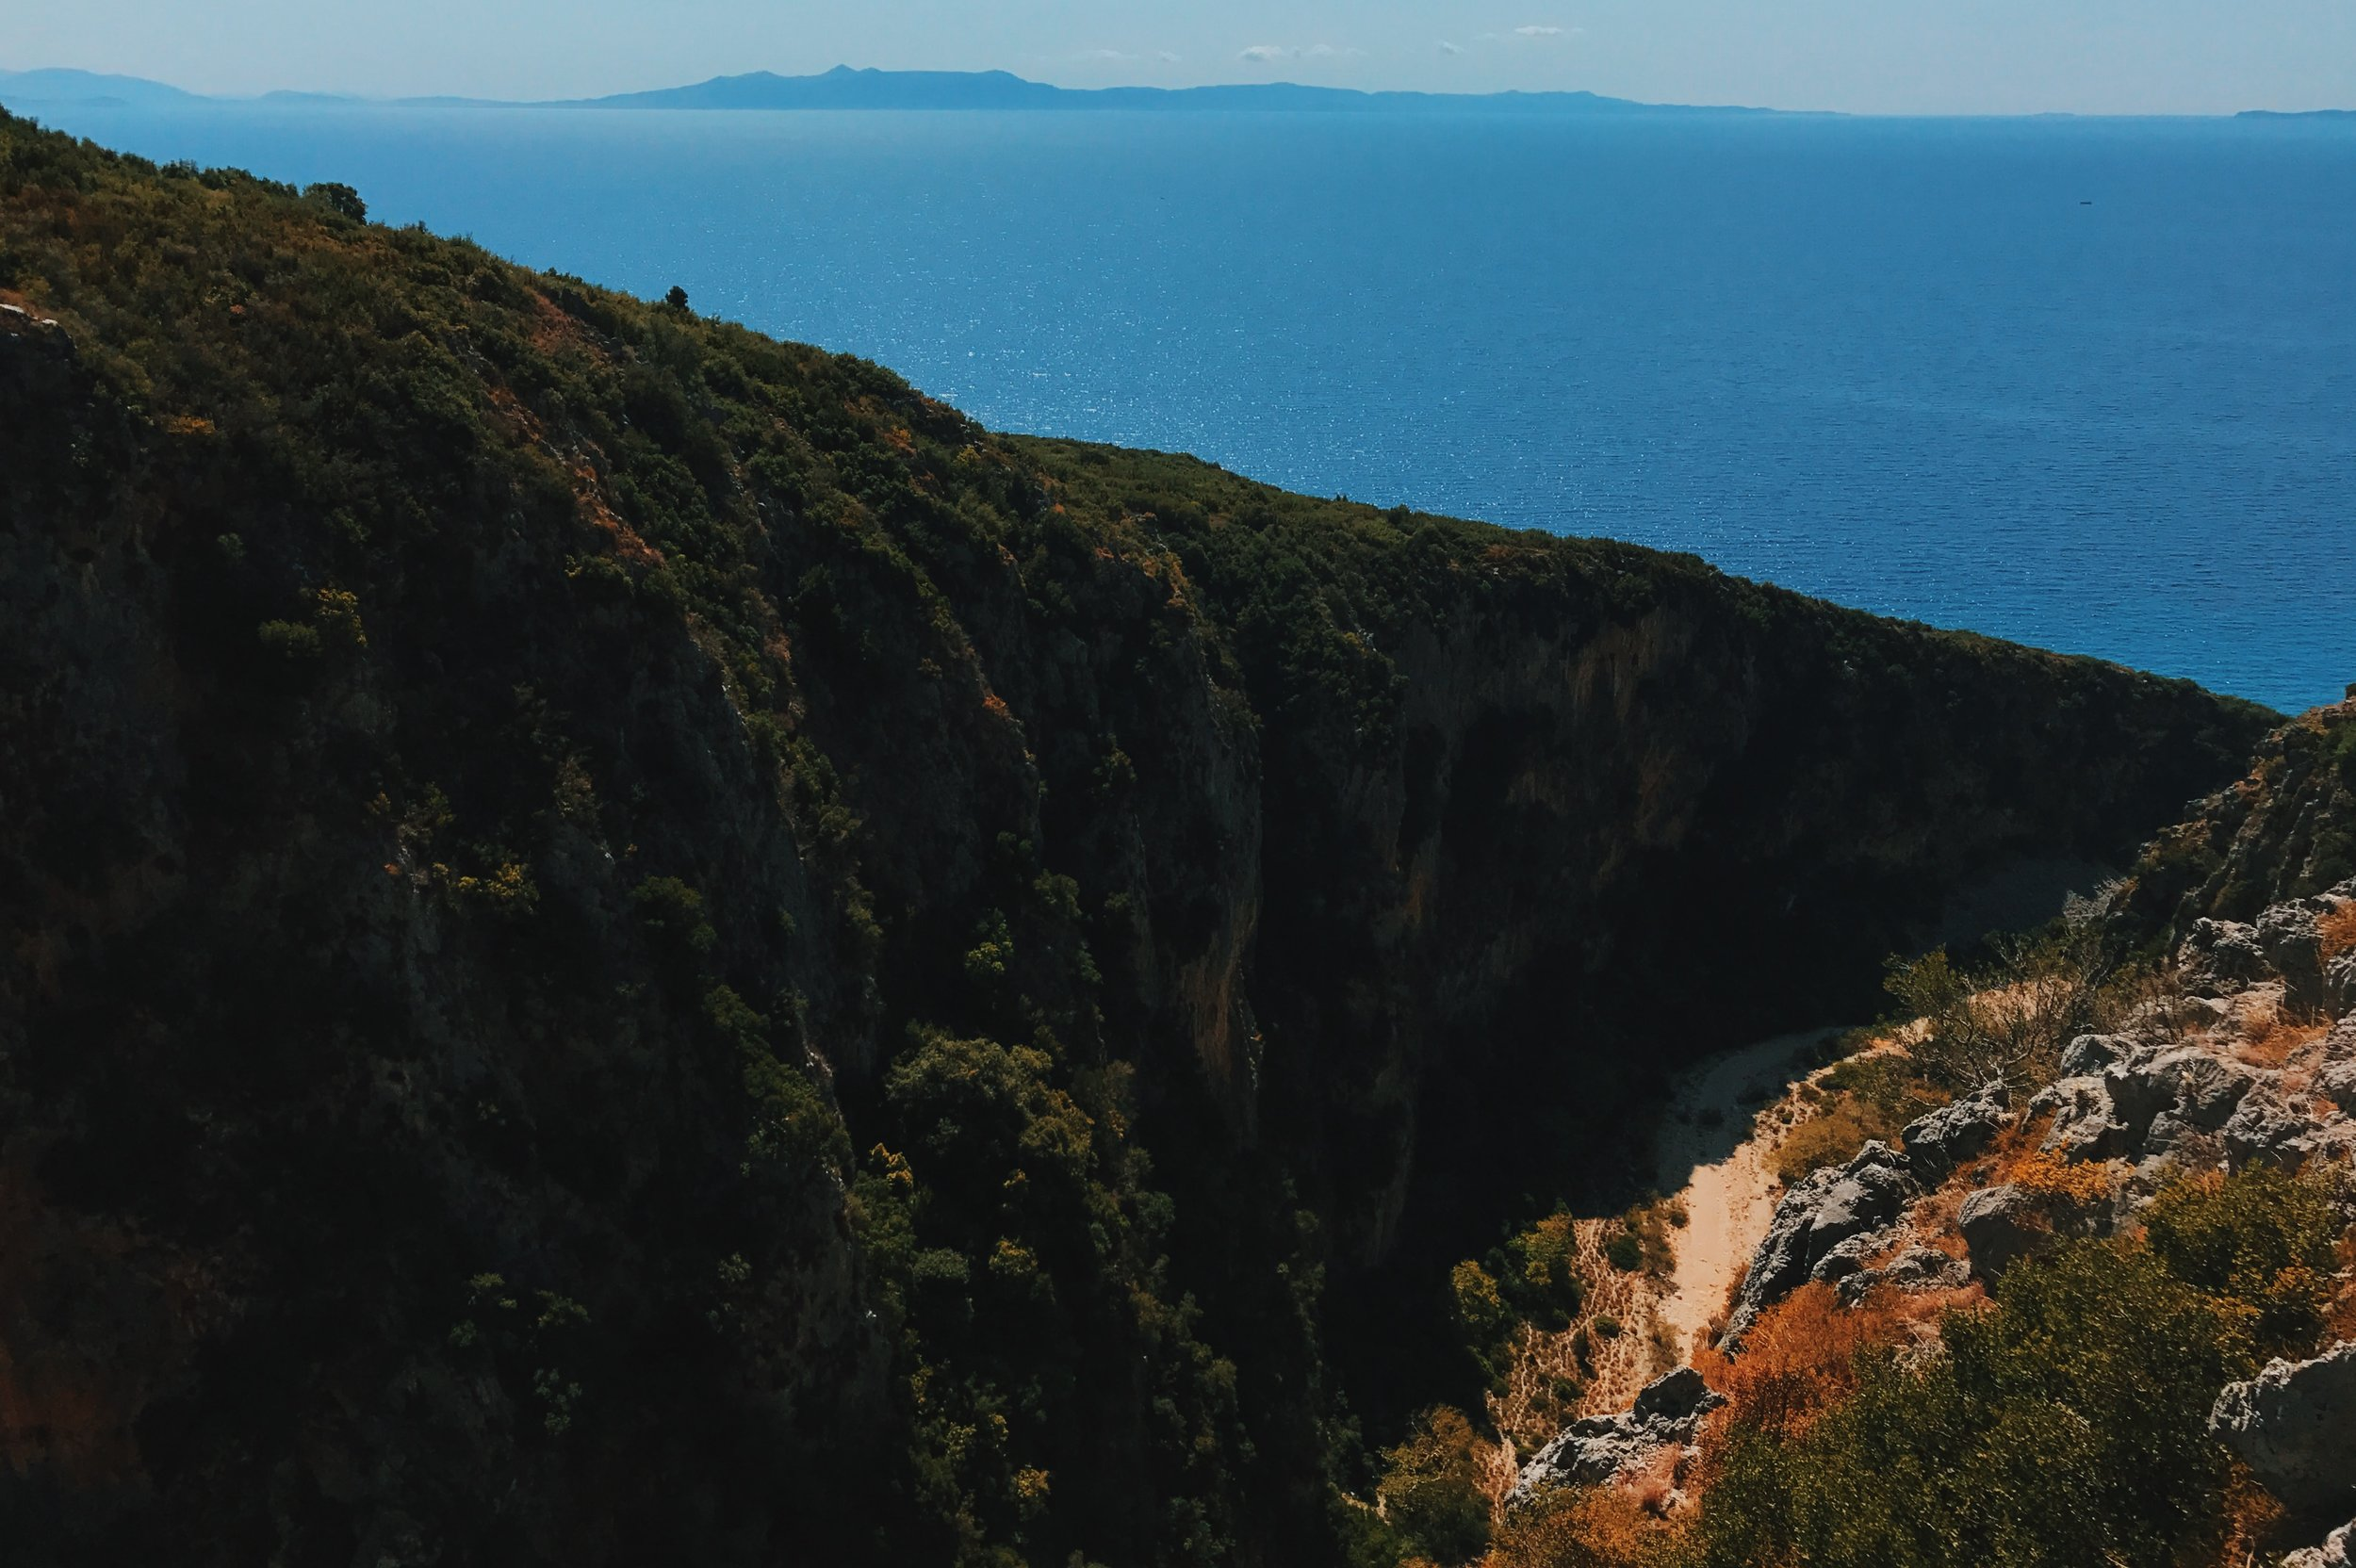 The canyon at Gjipe beach, Albania